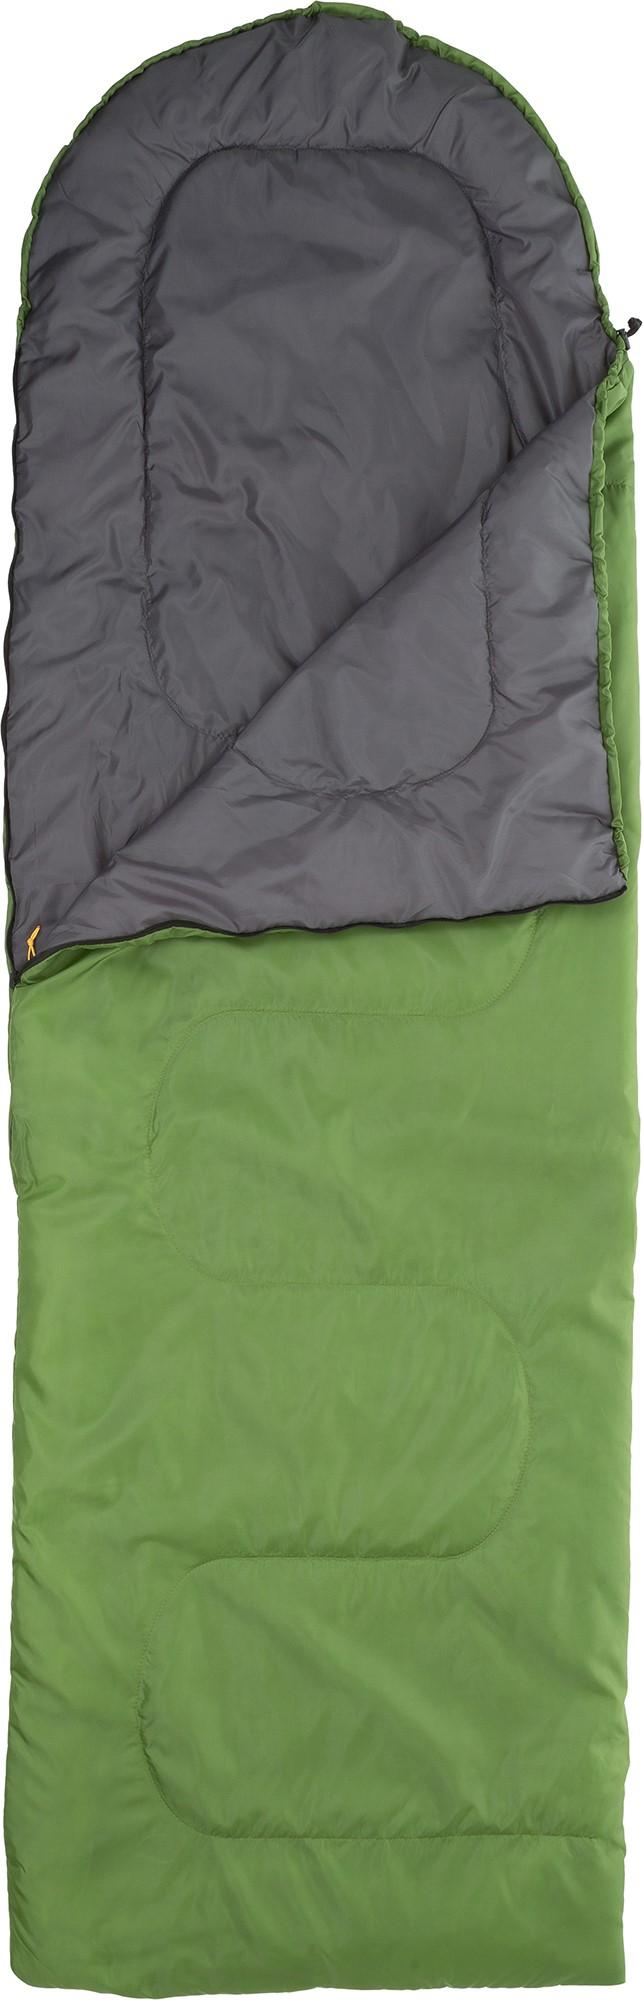 Outventure Outventure Comfort +20, размер 190